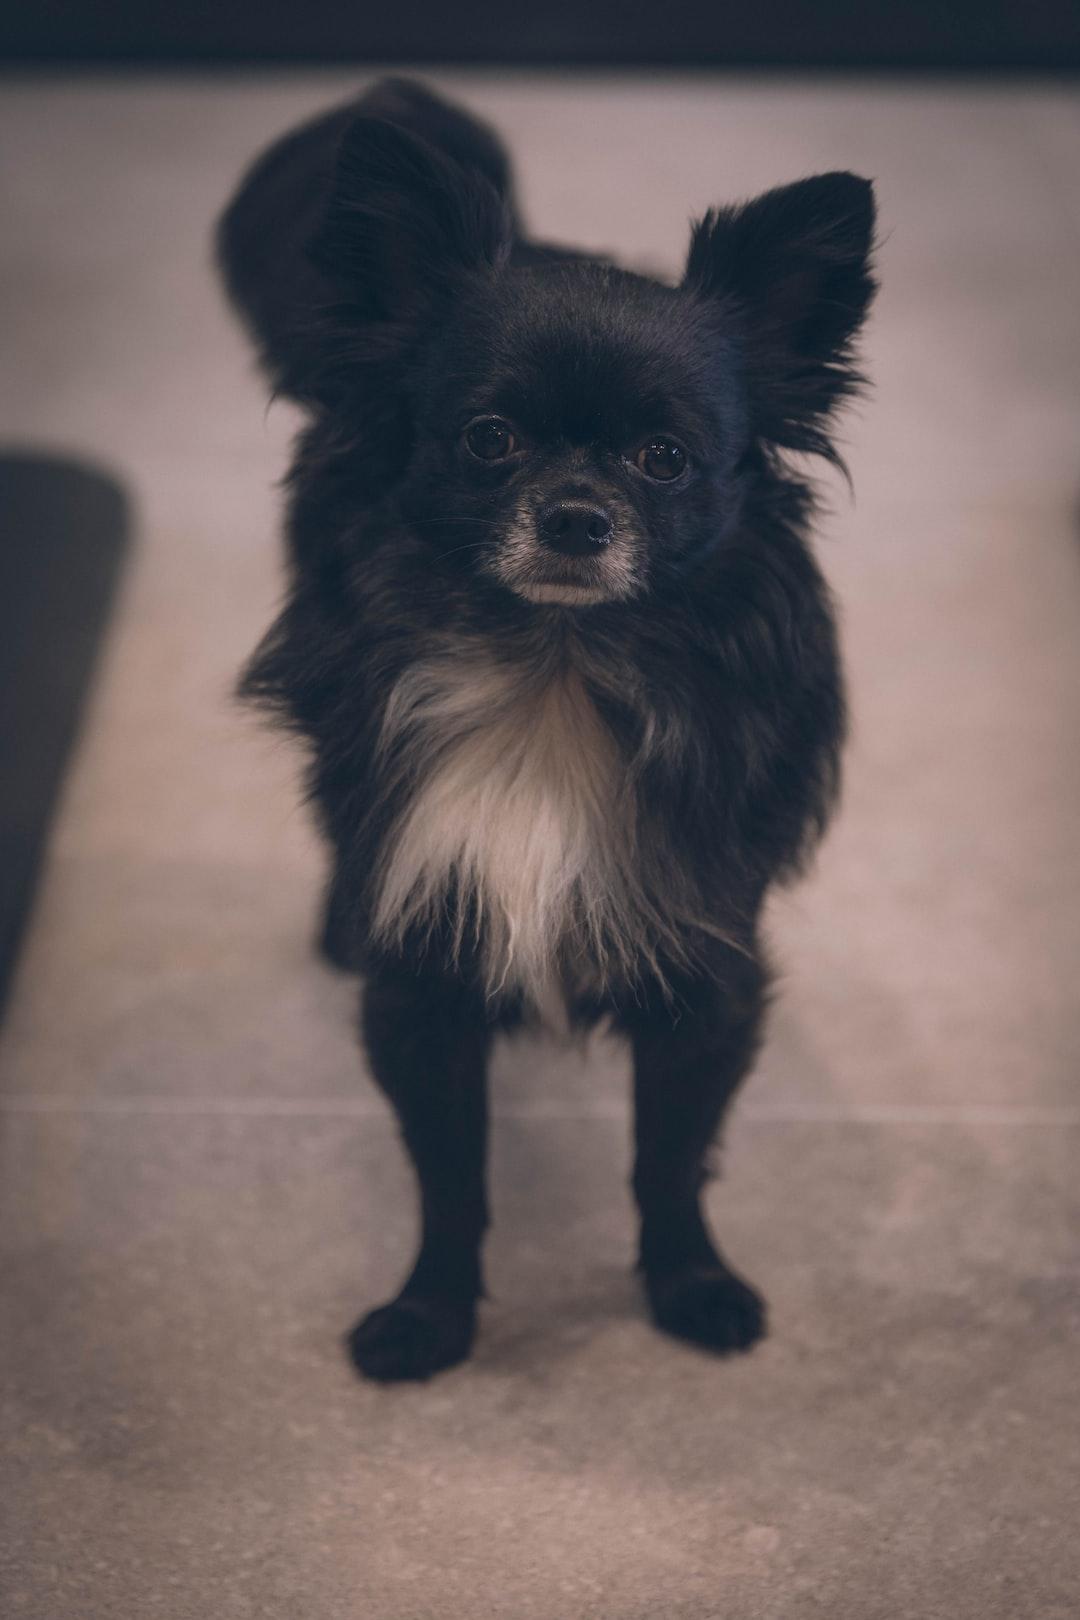 Cute black puppy dog pomeranian